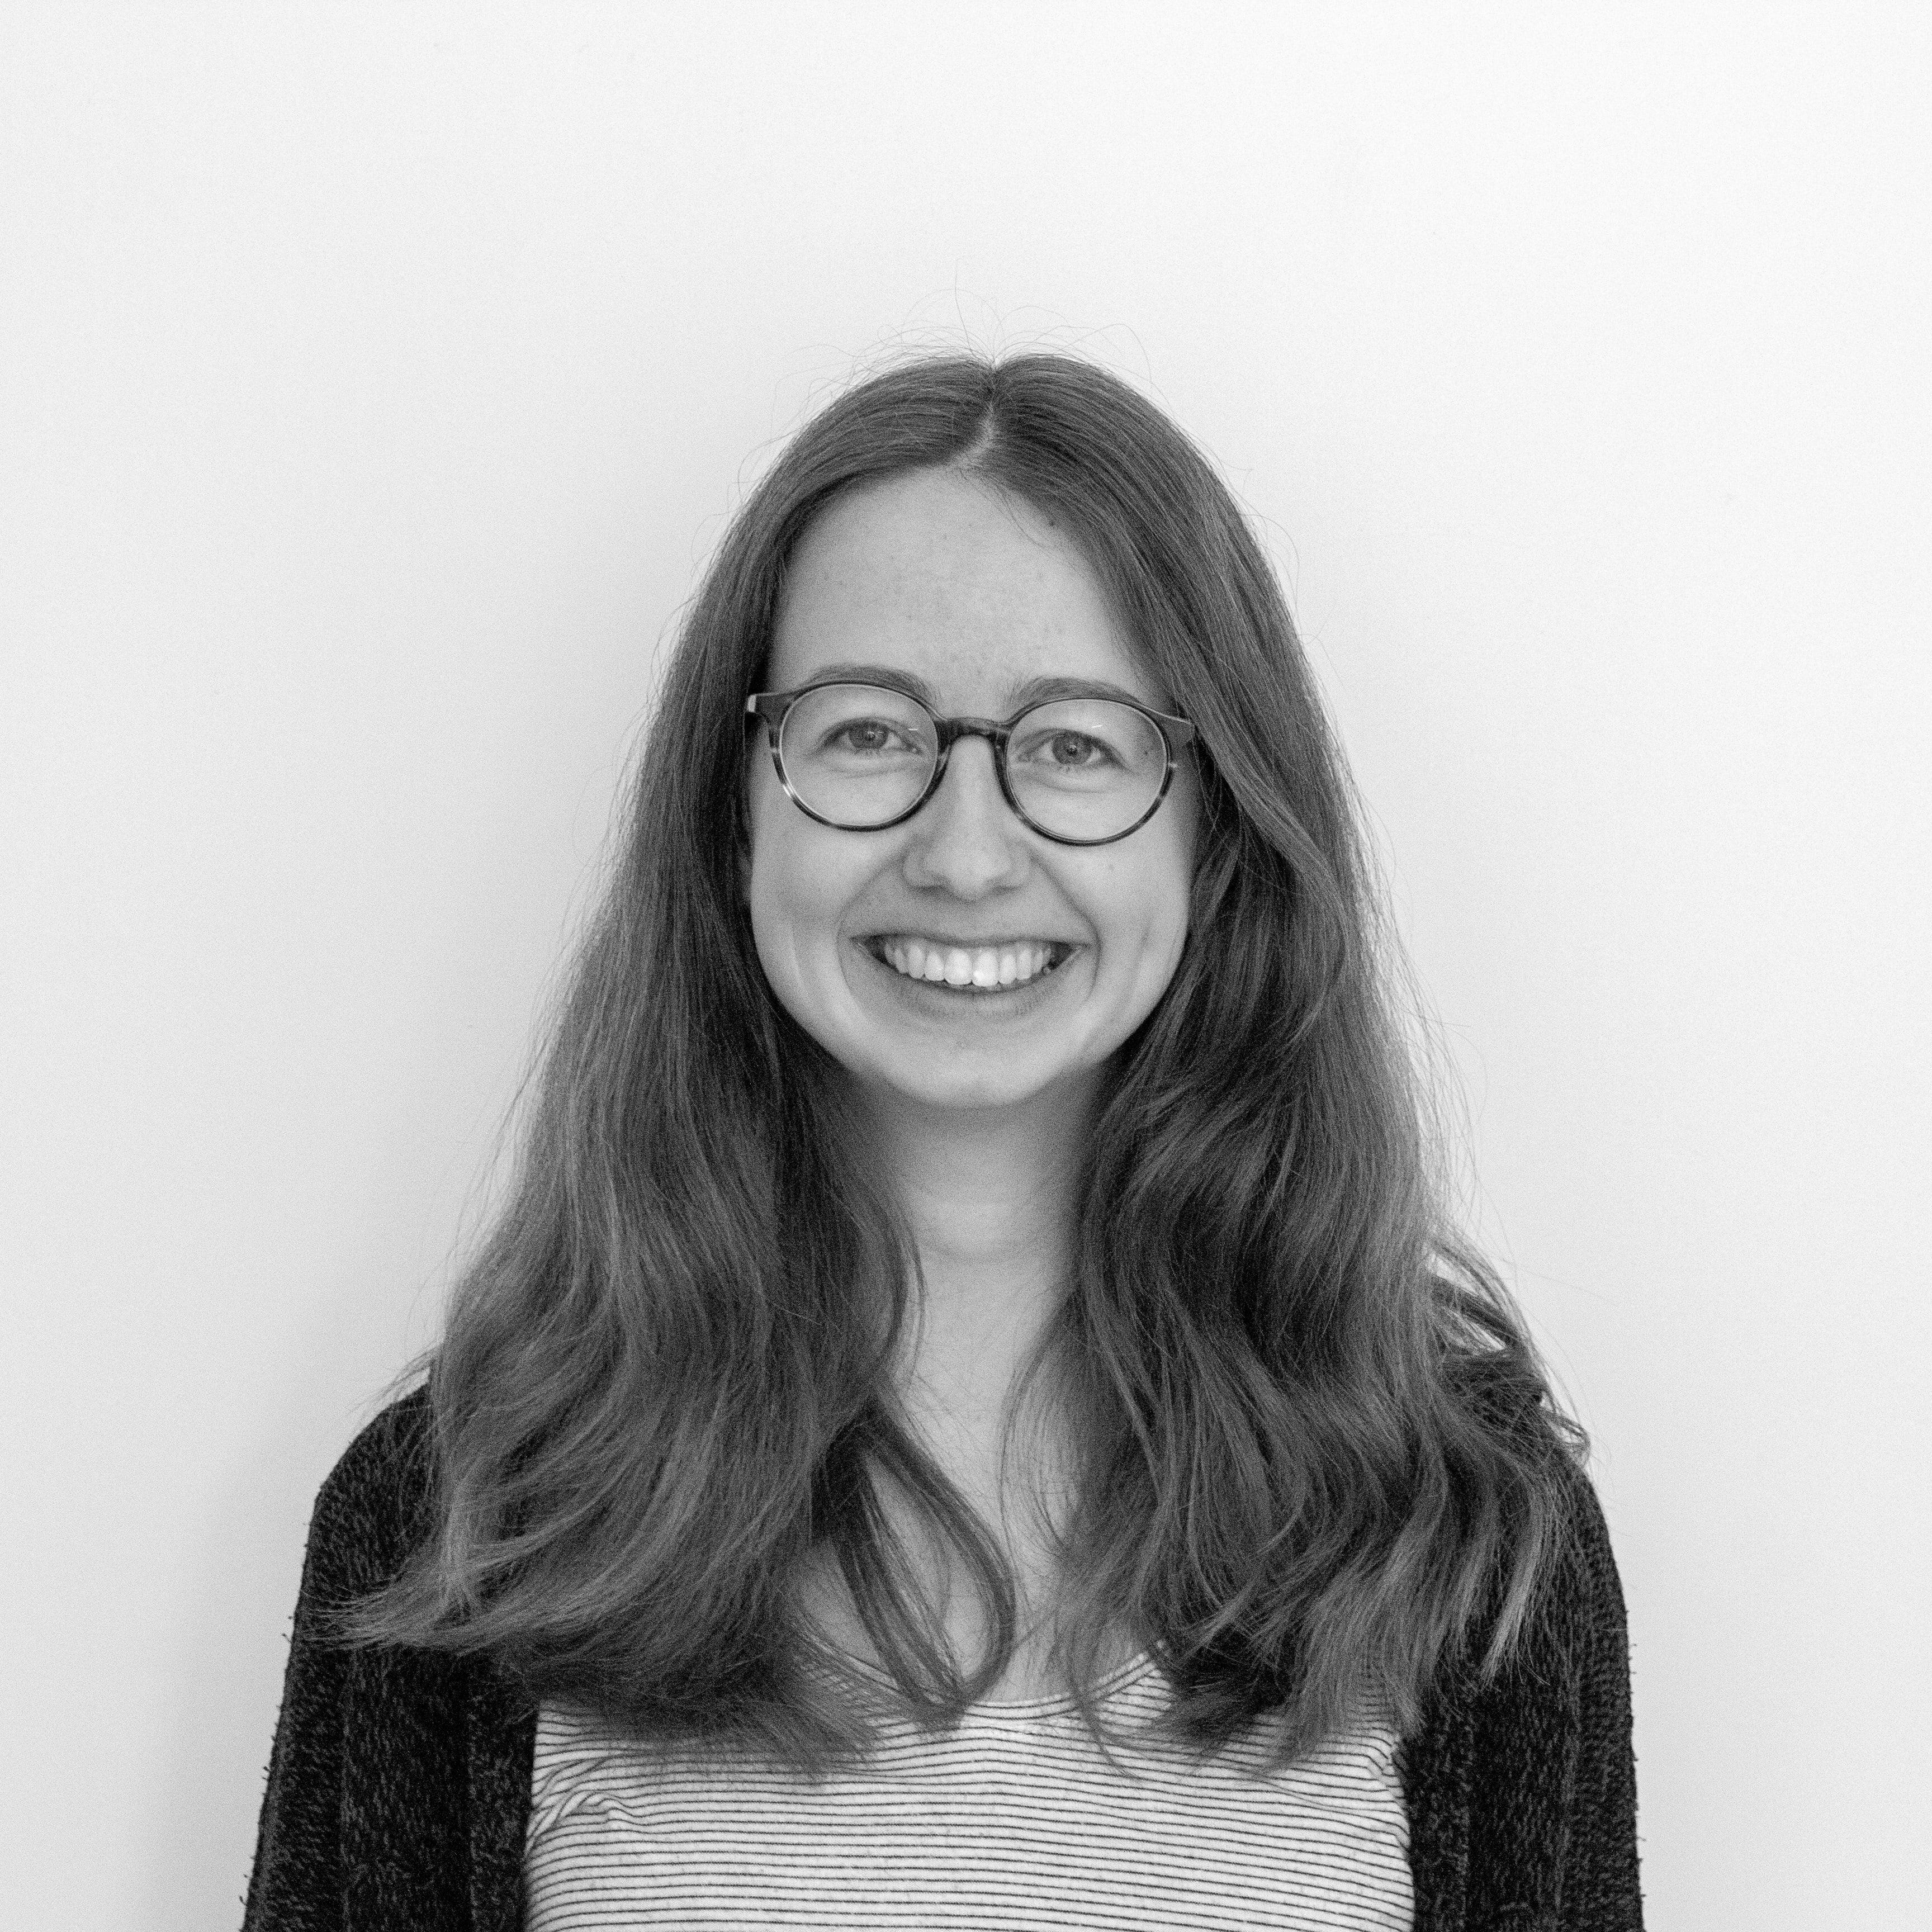 Lina Ellinghusen